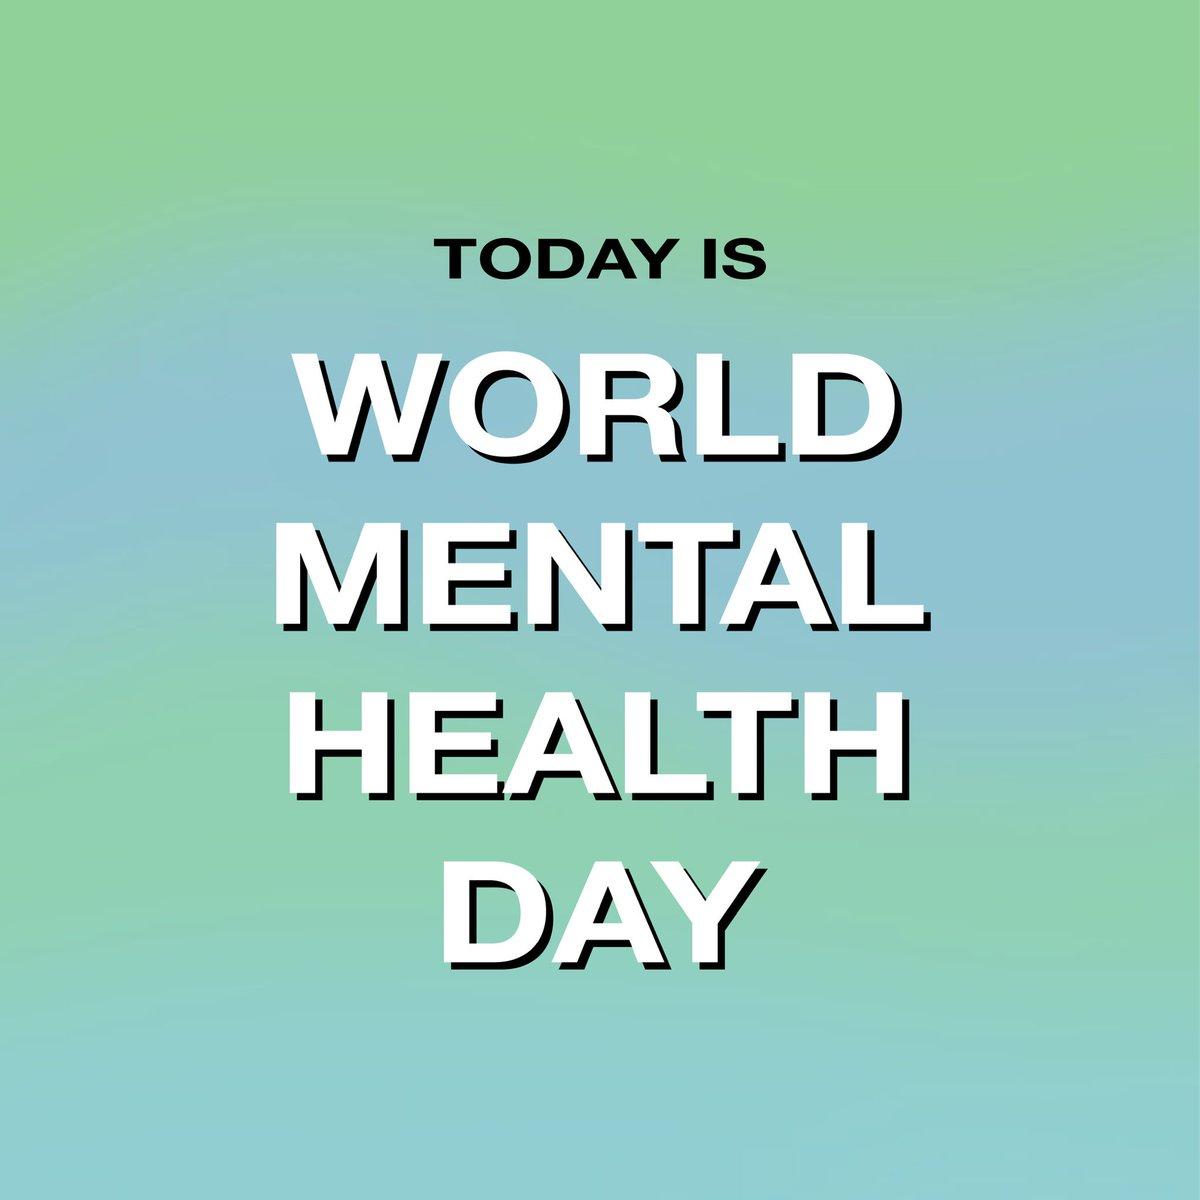 We need to treat every day like #WorldMentalHealthDay.